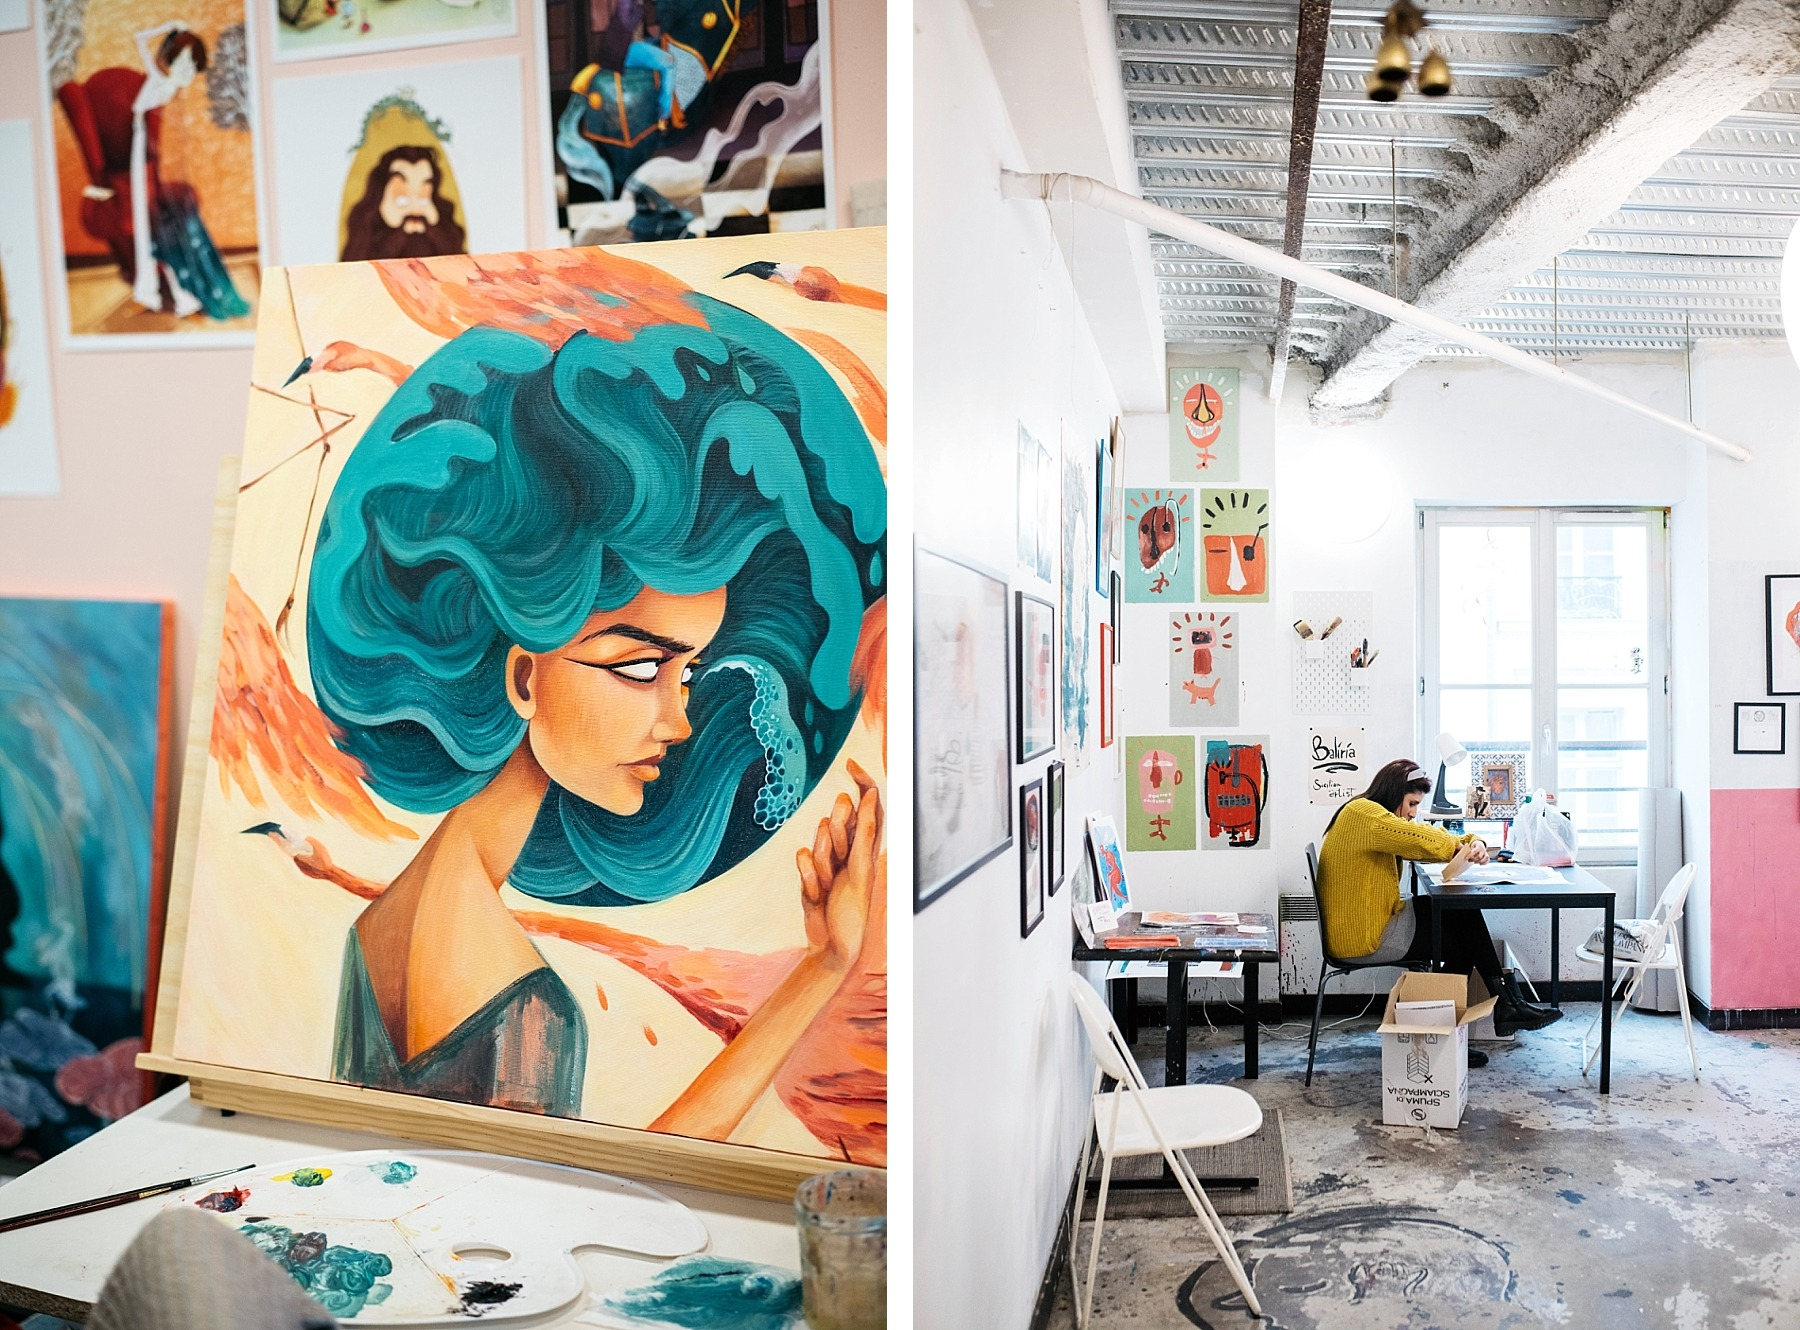 Paris Insolite - 59 rue rivoli